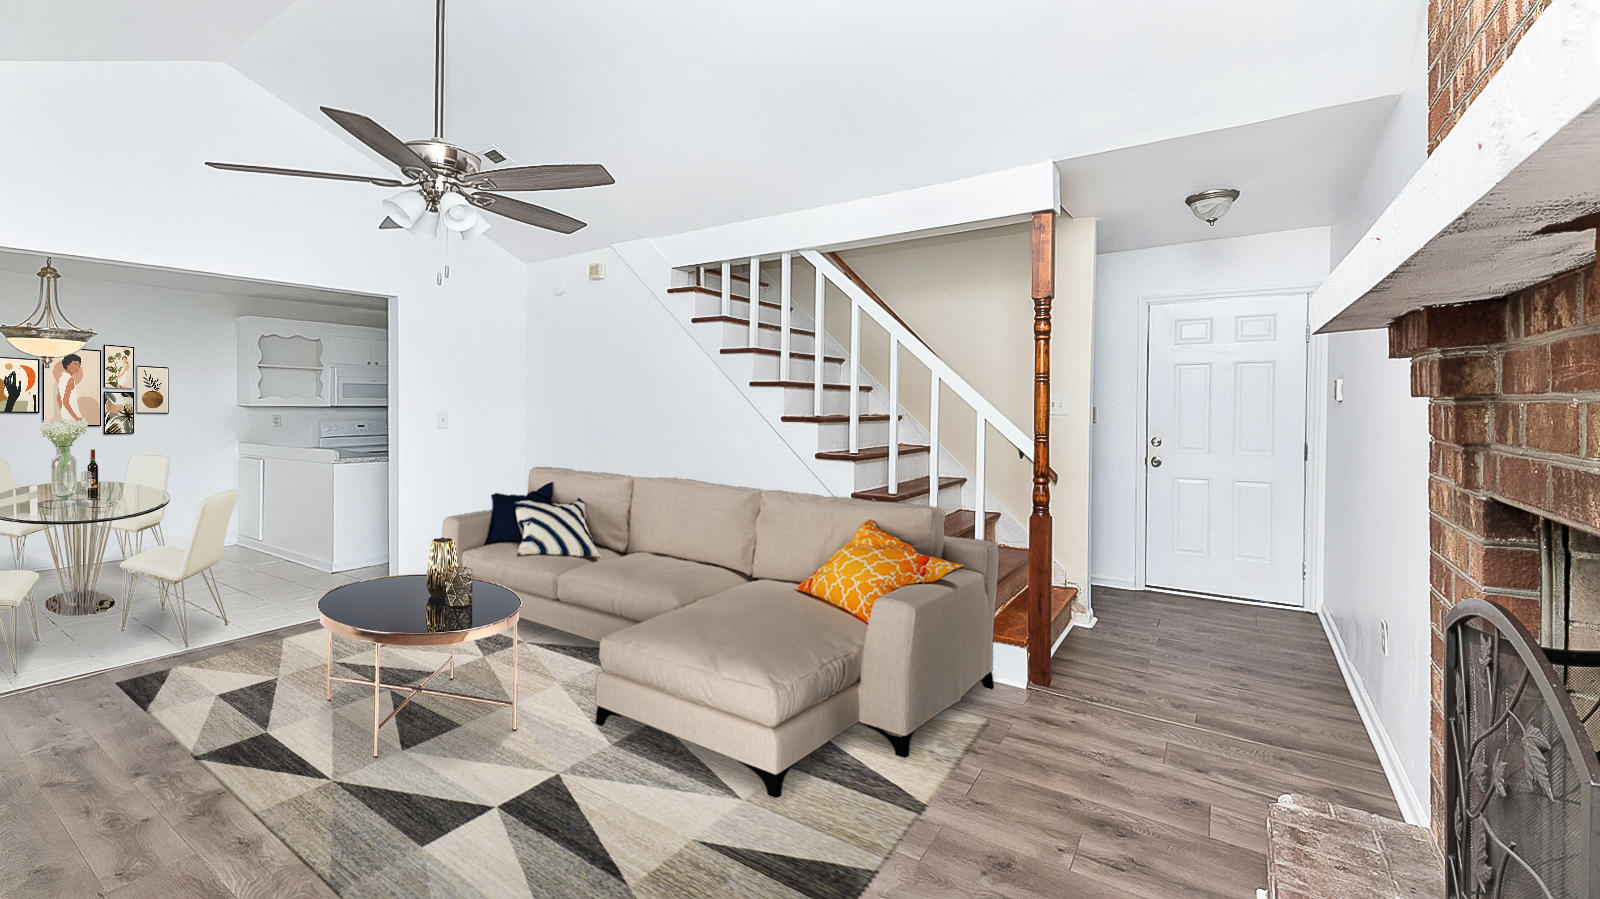 Ashley Villas Homes For Sale - 4315 Briarstone, North Charleston, SC - 26